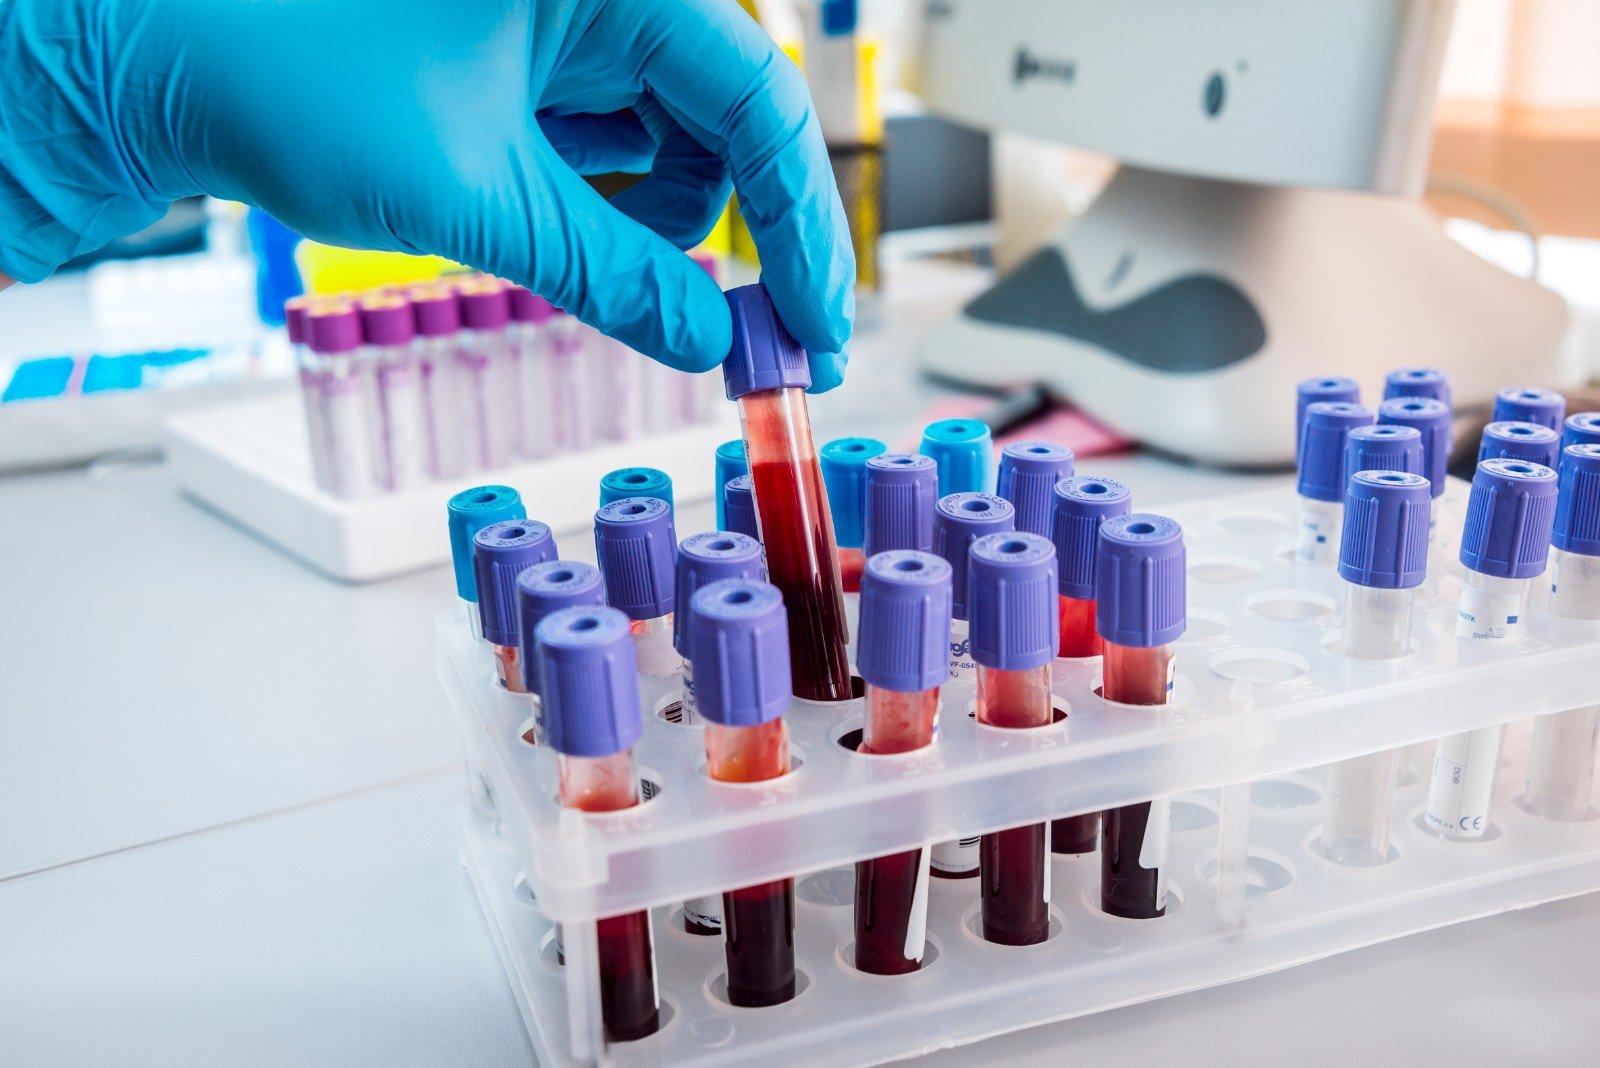 Apparecchiature mediche. Test di sangue